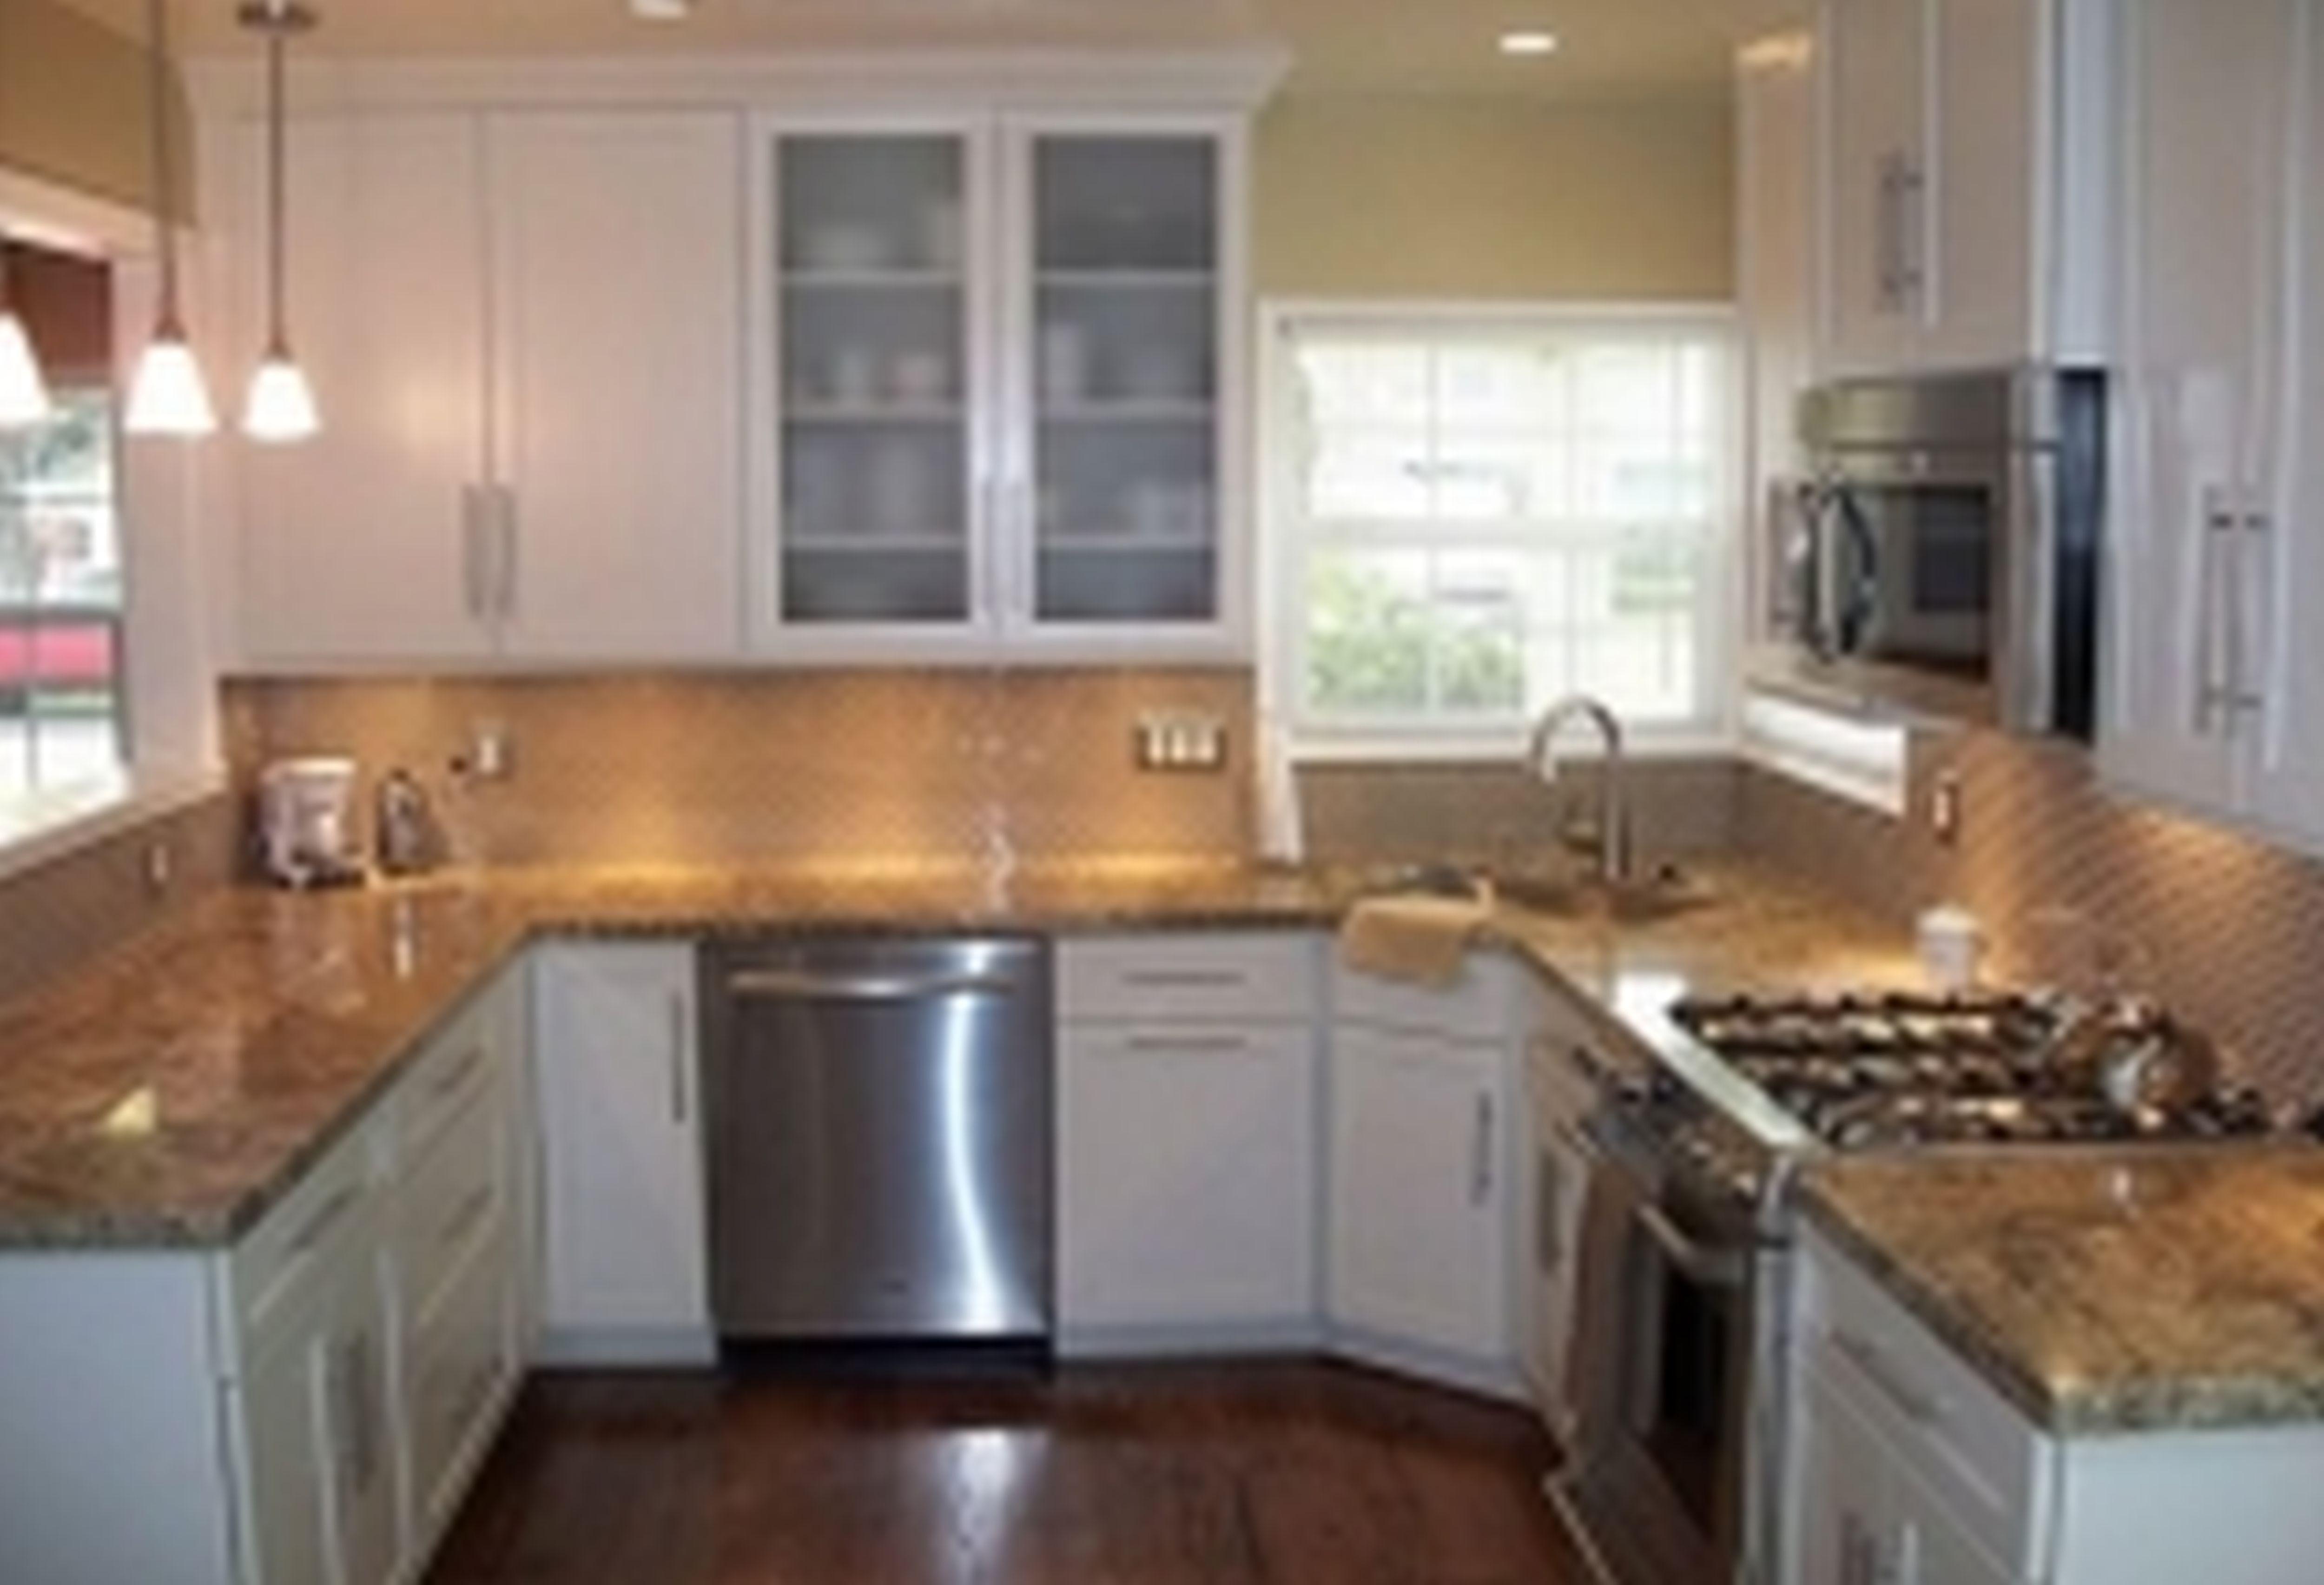 Corner Sink Kitchen Design Kitchen design small, Small